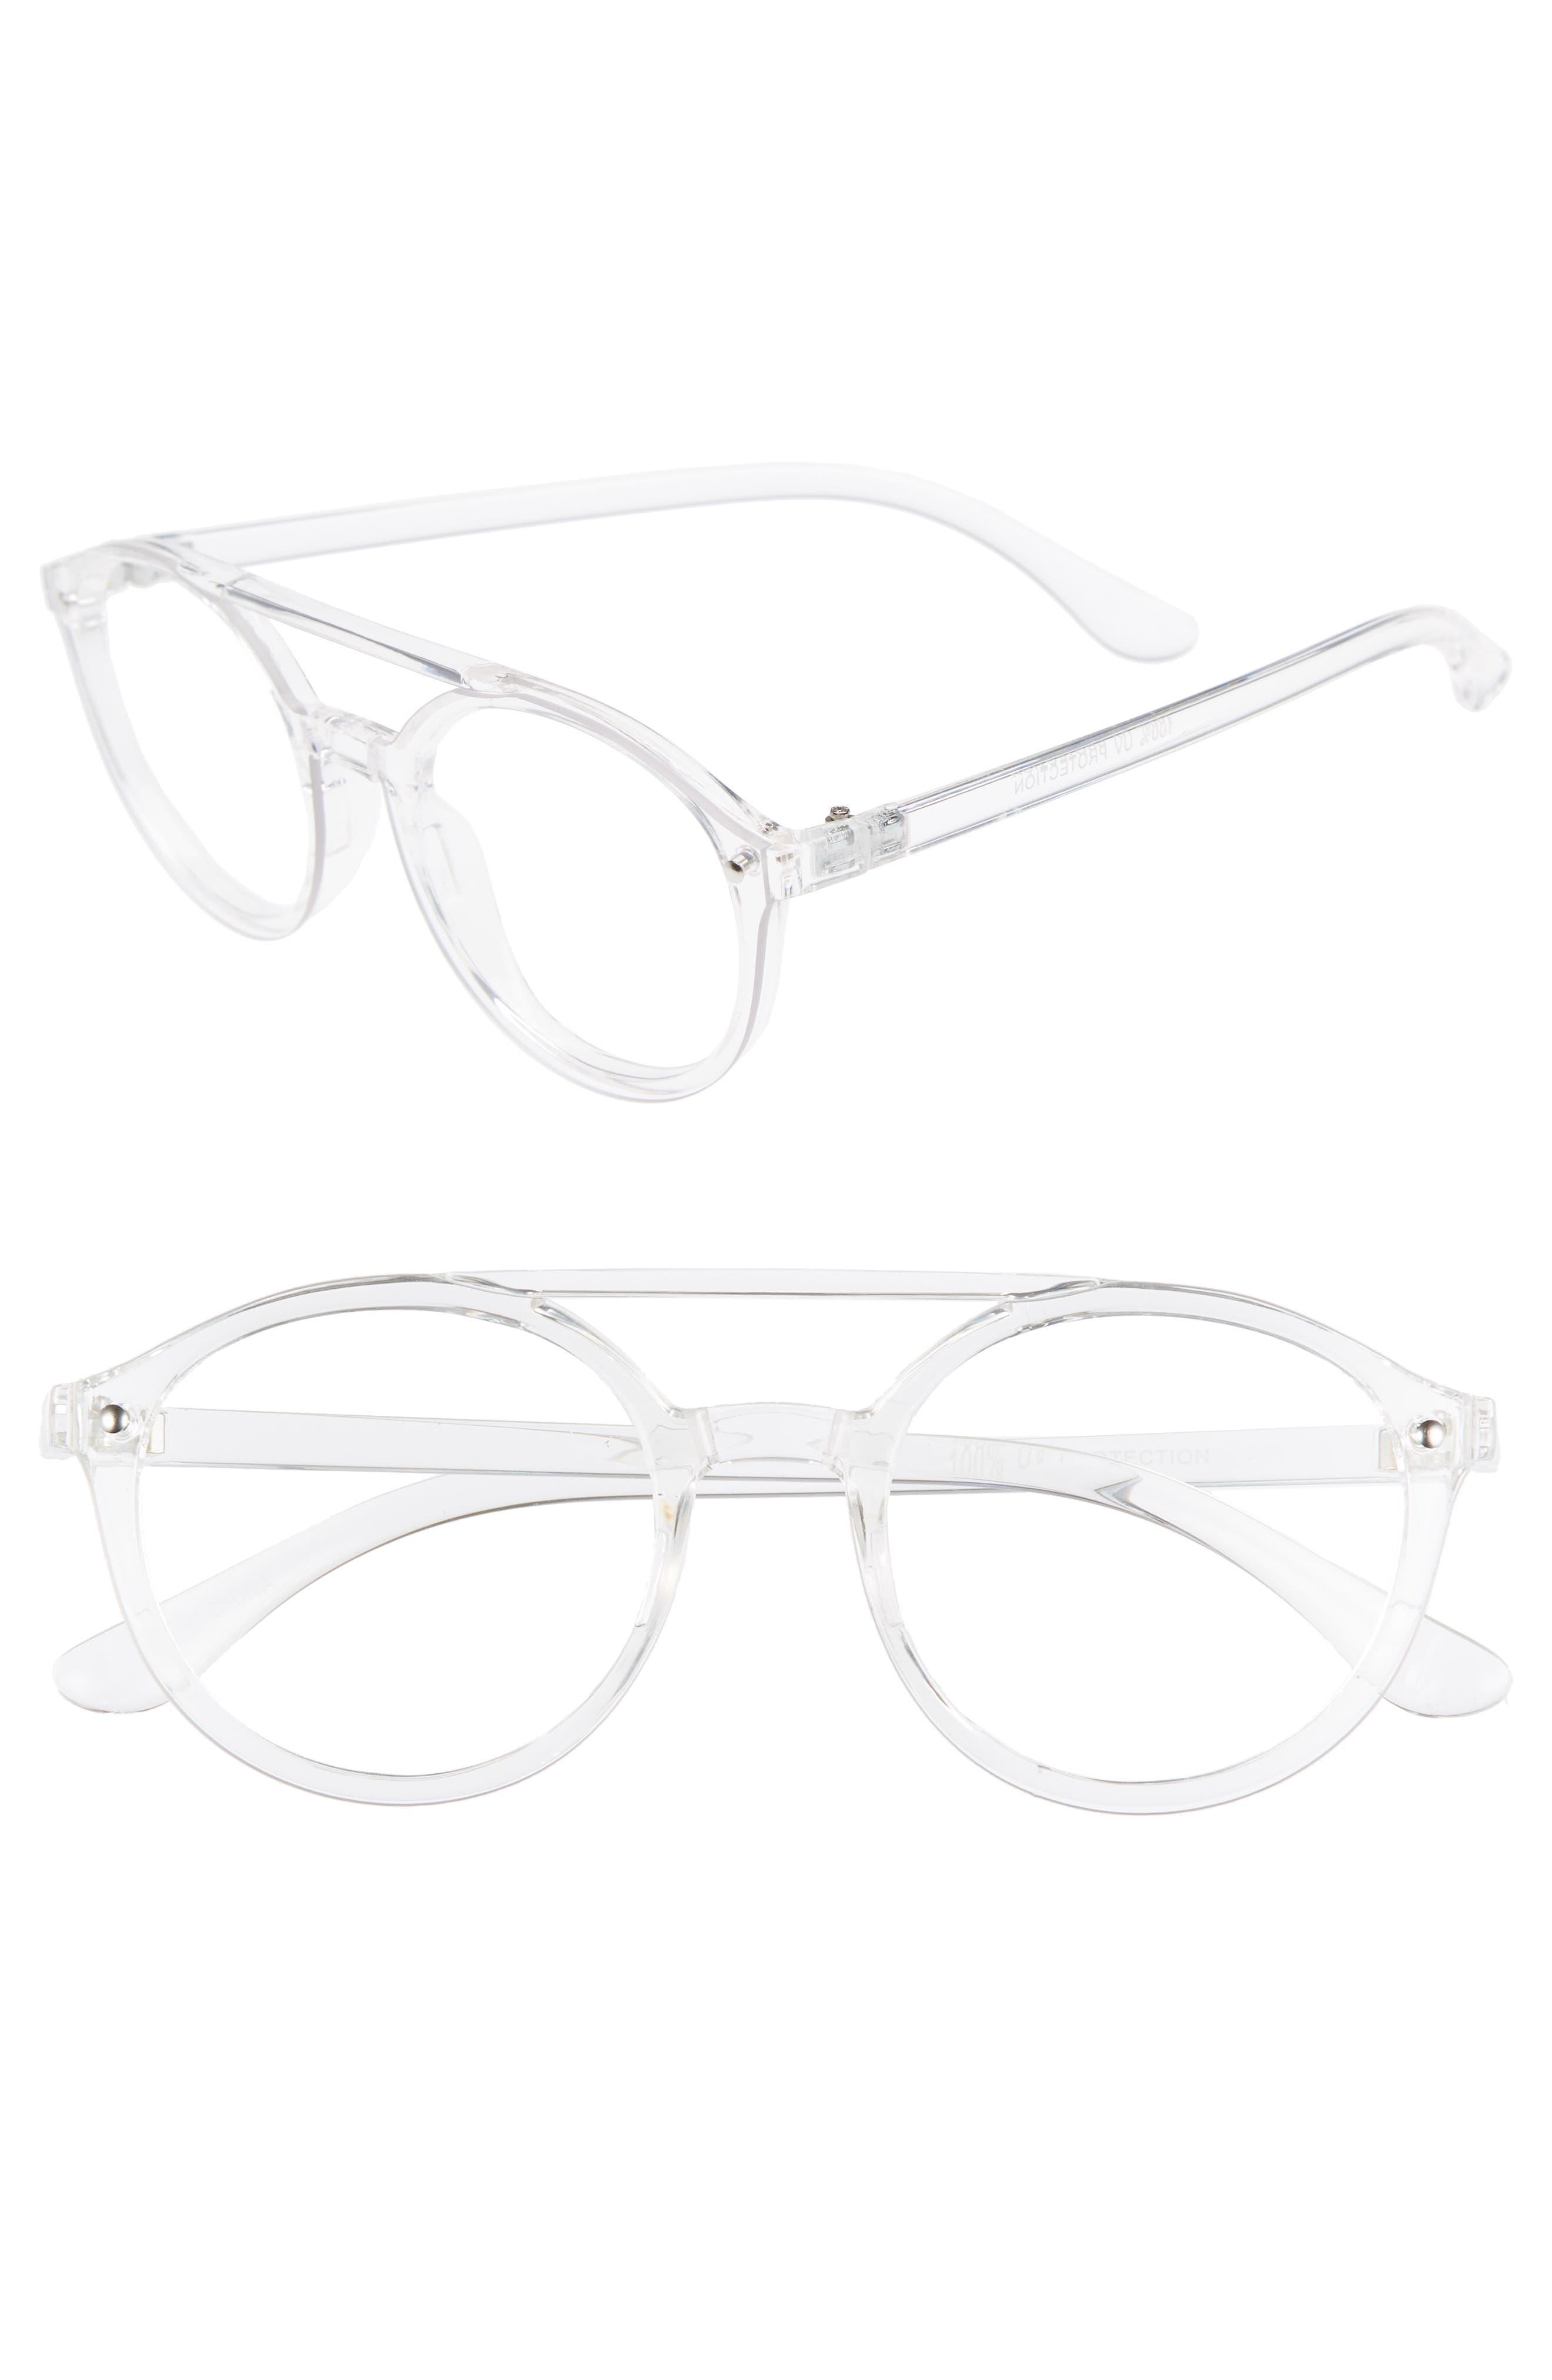 54mm Aviator Fashion Glasses,                             Main thumbnail 1, color,                             CLEAR